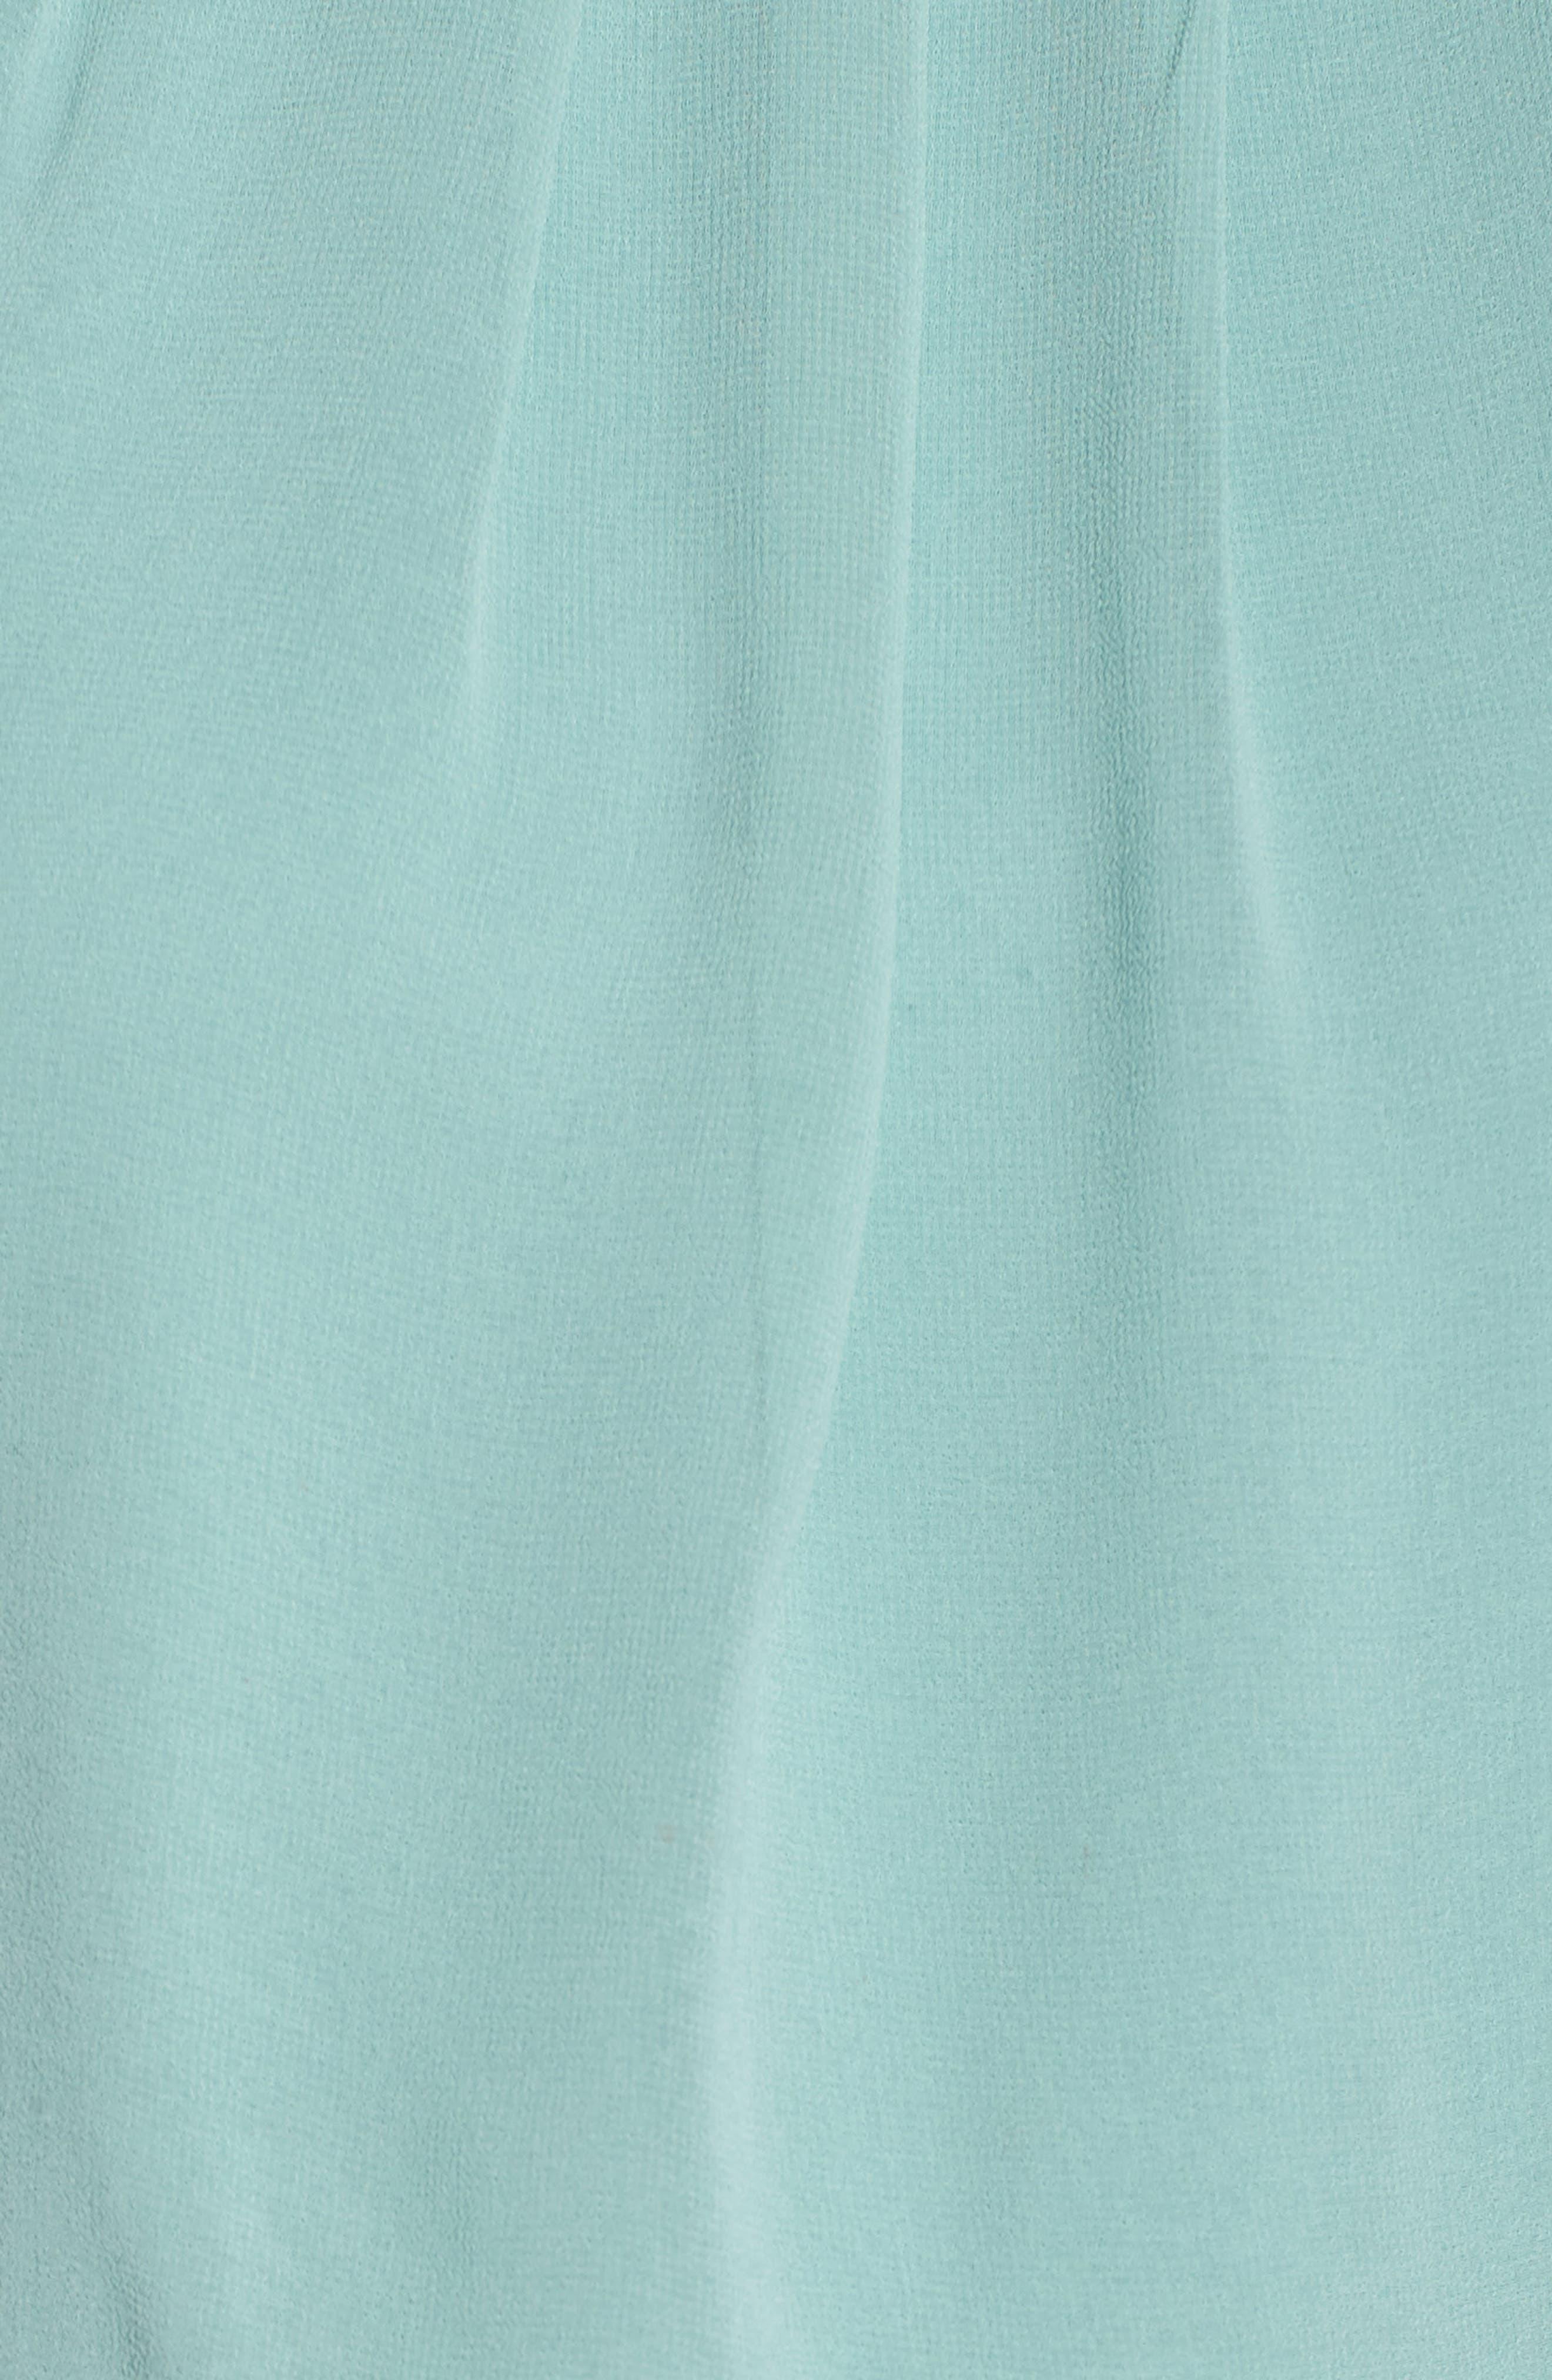 Blouson Chiffon Skater Dress,                             Alternate thumbnail 204, color,